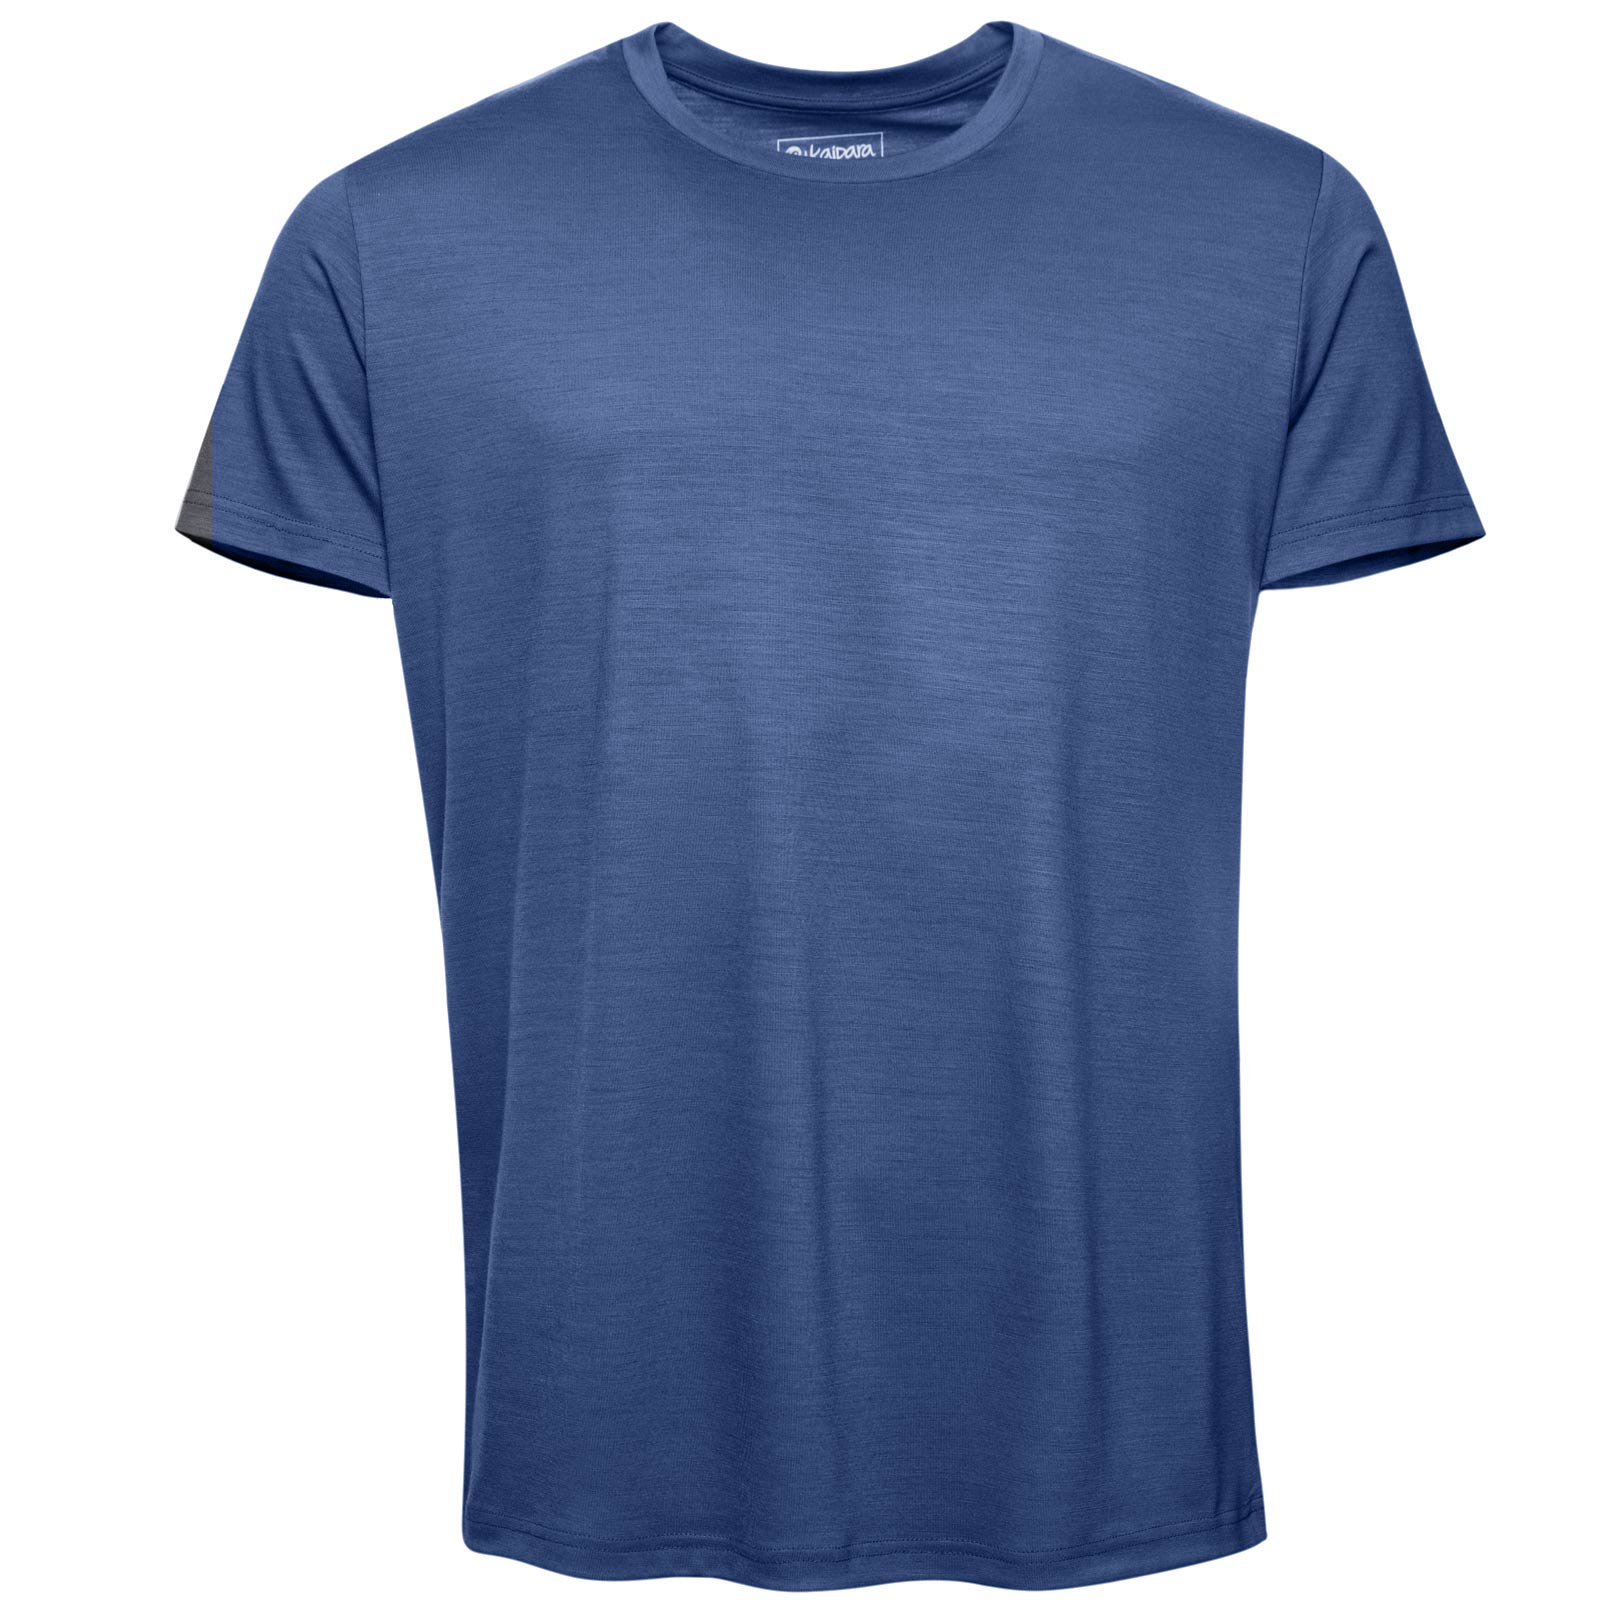 URBAN LIMITED Merino T-Shirt Herren Kurzarm Regular 200 Blue Melange L